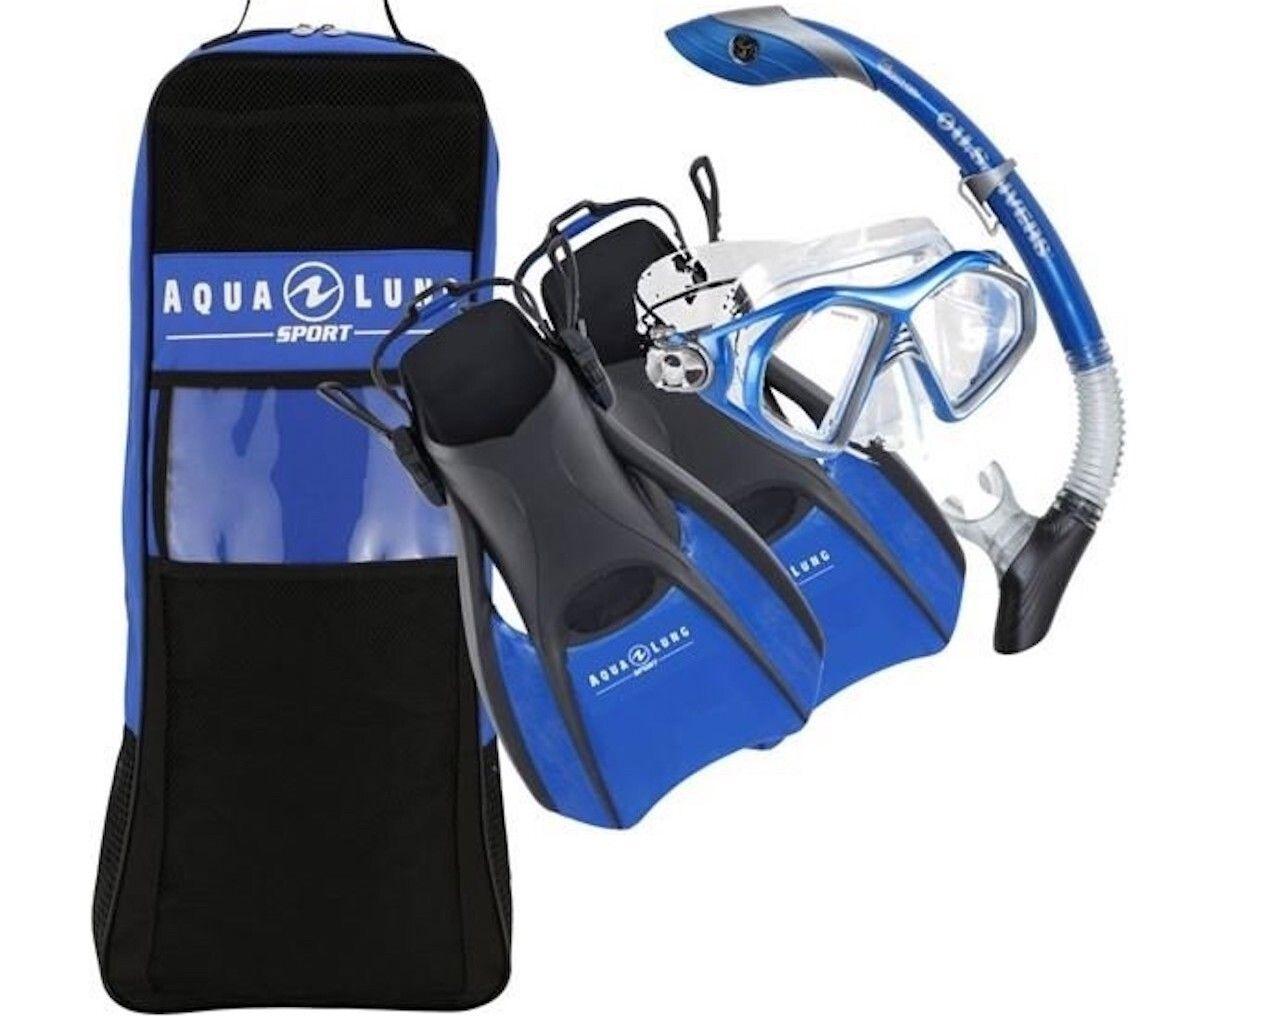 Beach-essentials-aqua-lung-sport-trooper-snorkel-set,beach essentials